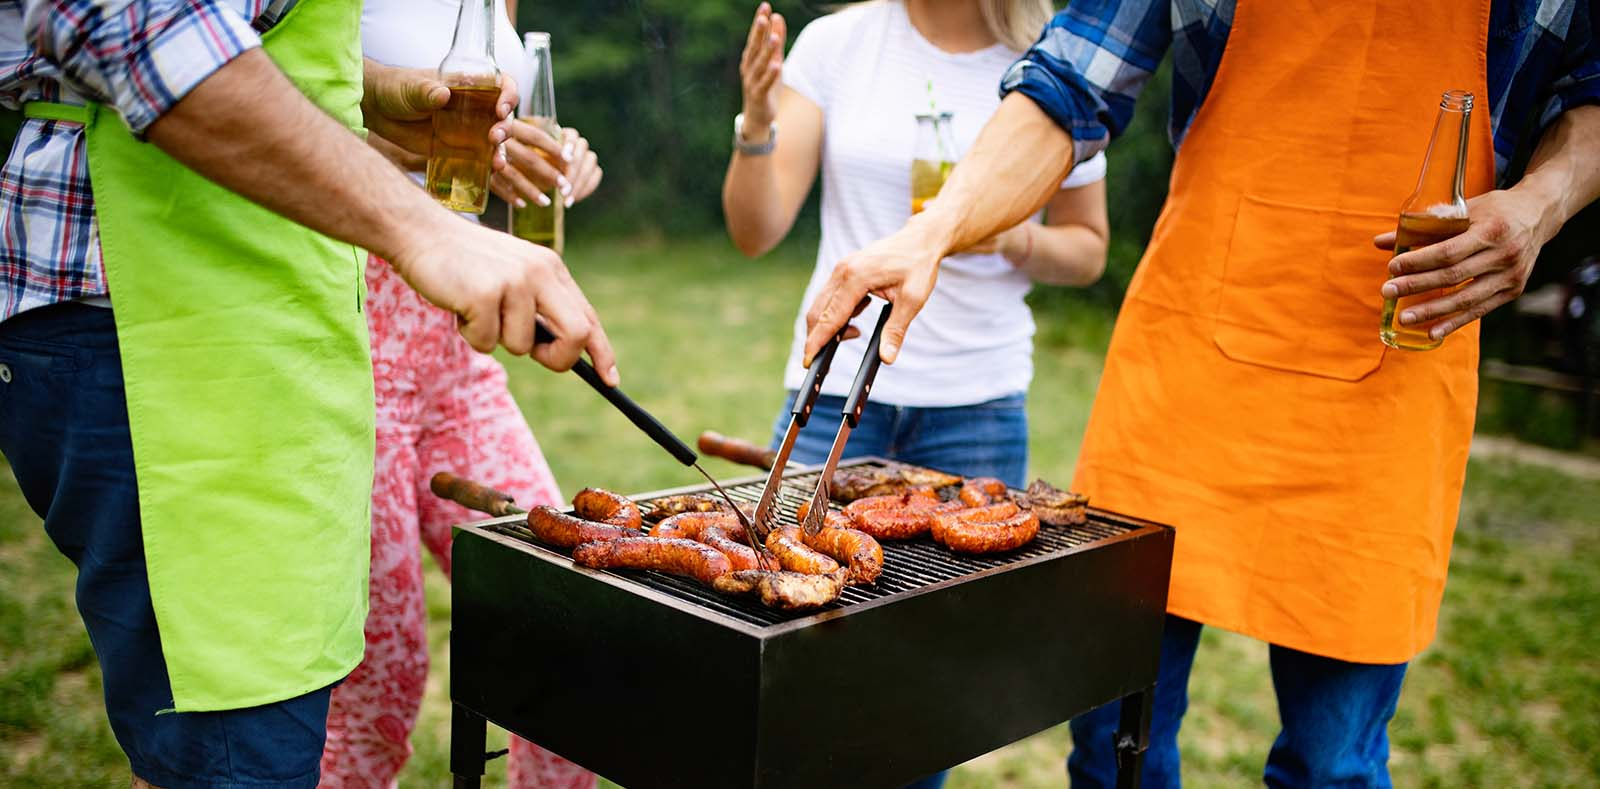 Hoe kies je de juiste barbecue?